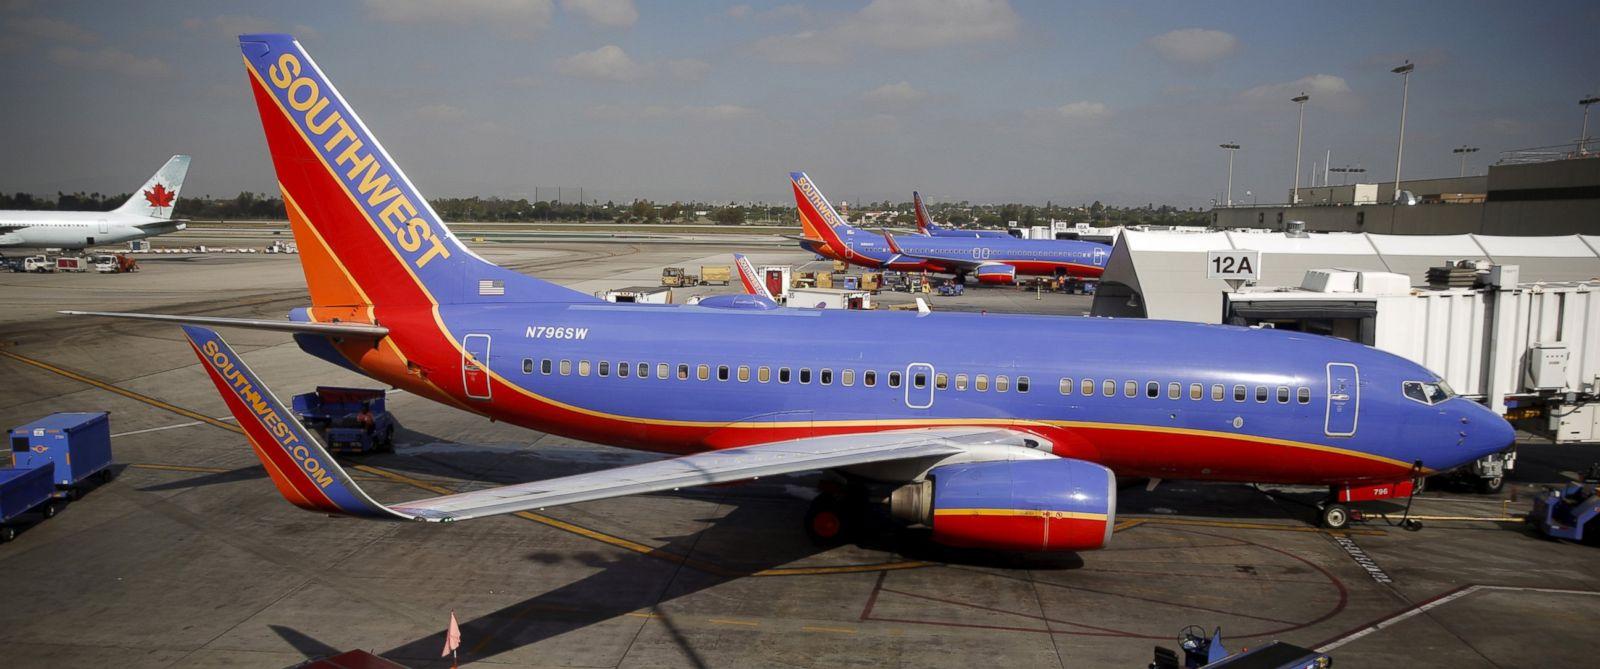 Https Abcnews Go Com Us Flight Diverted Suspicious Behavior Southwest Airlines Passengers Story Id 35356214